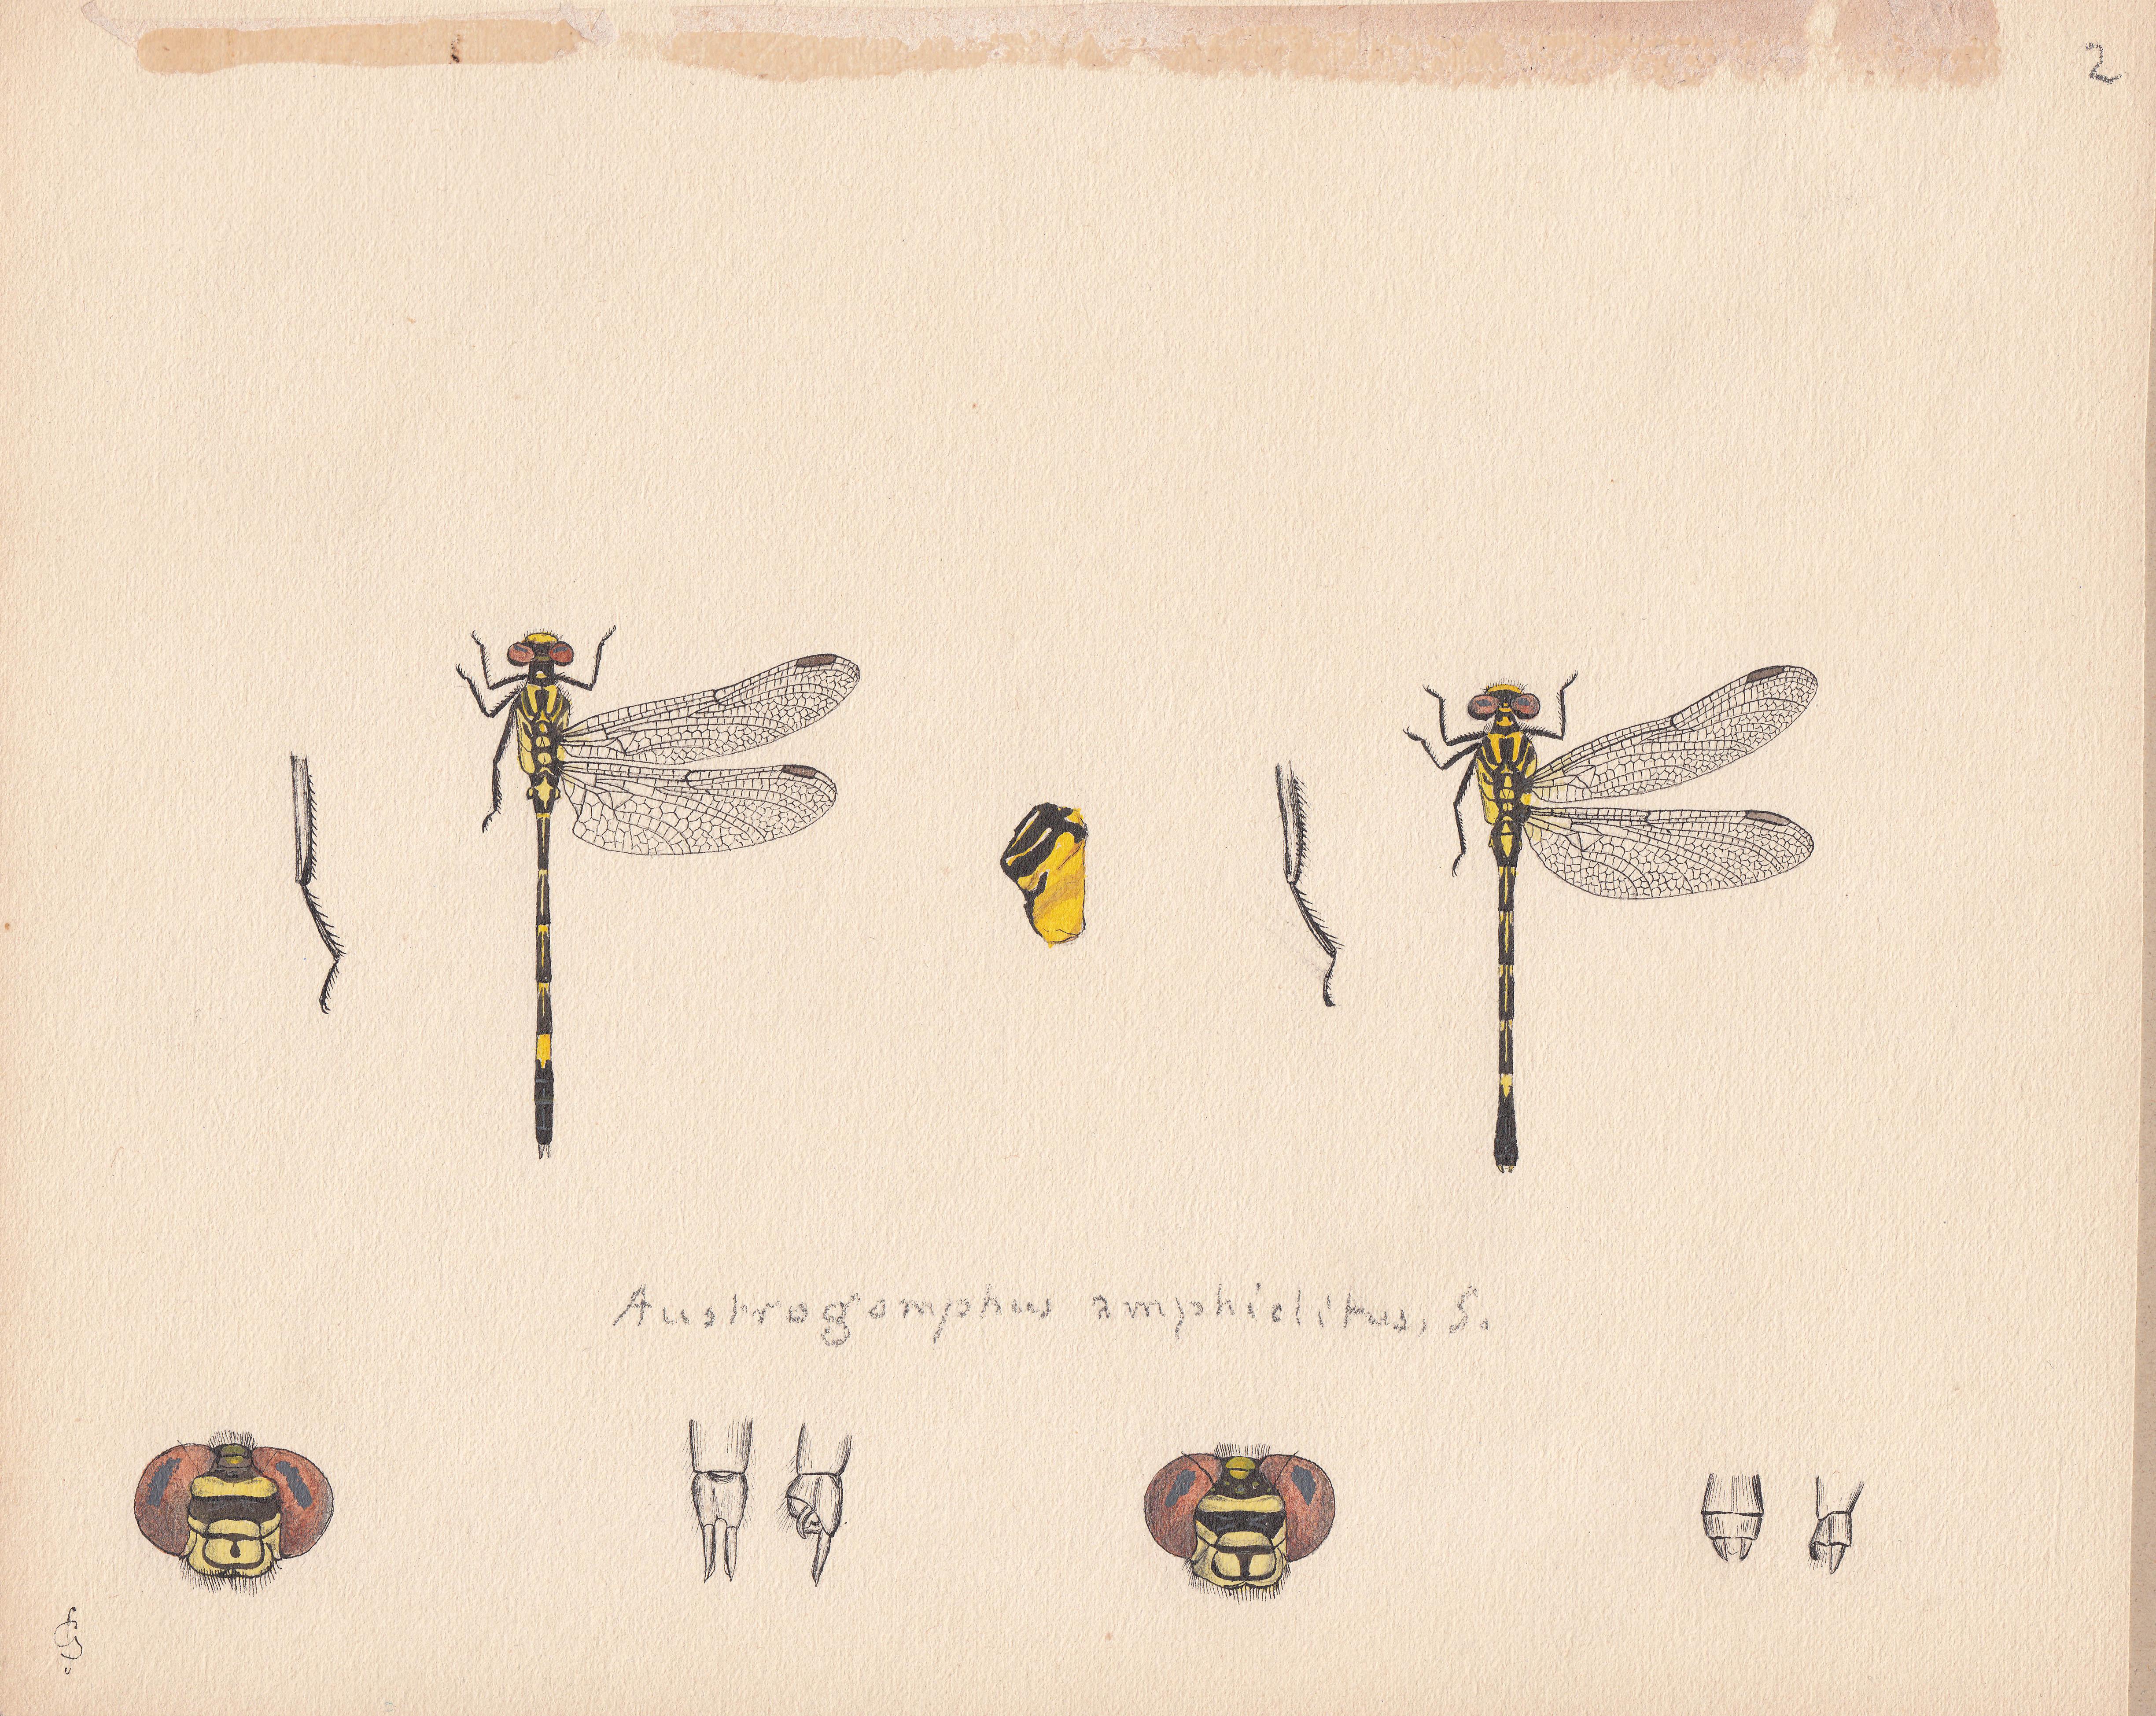 Austrogomphus amphiclitus.jpg